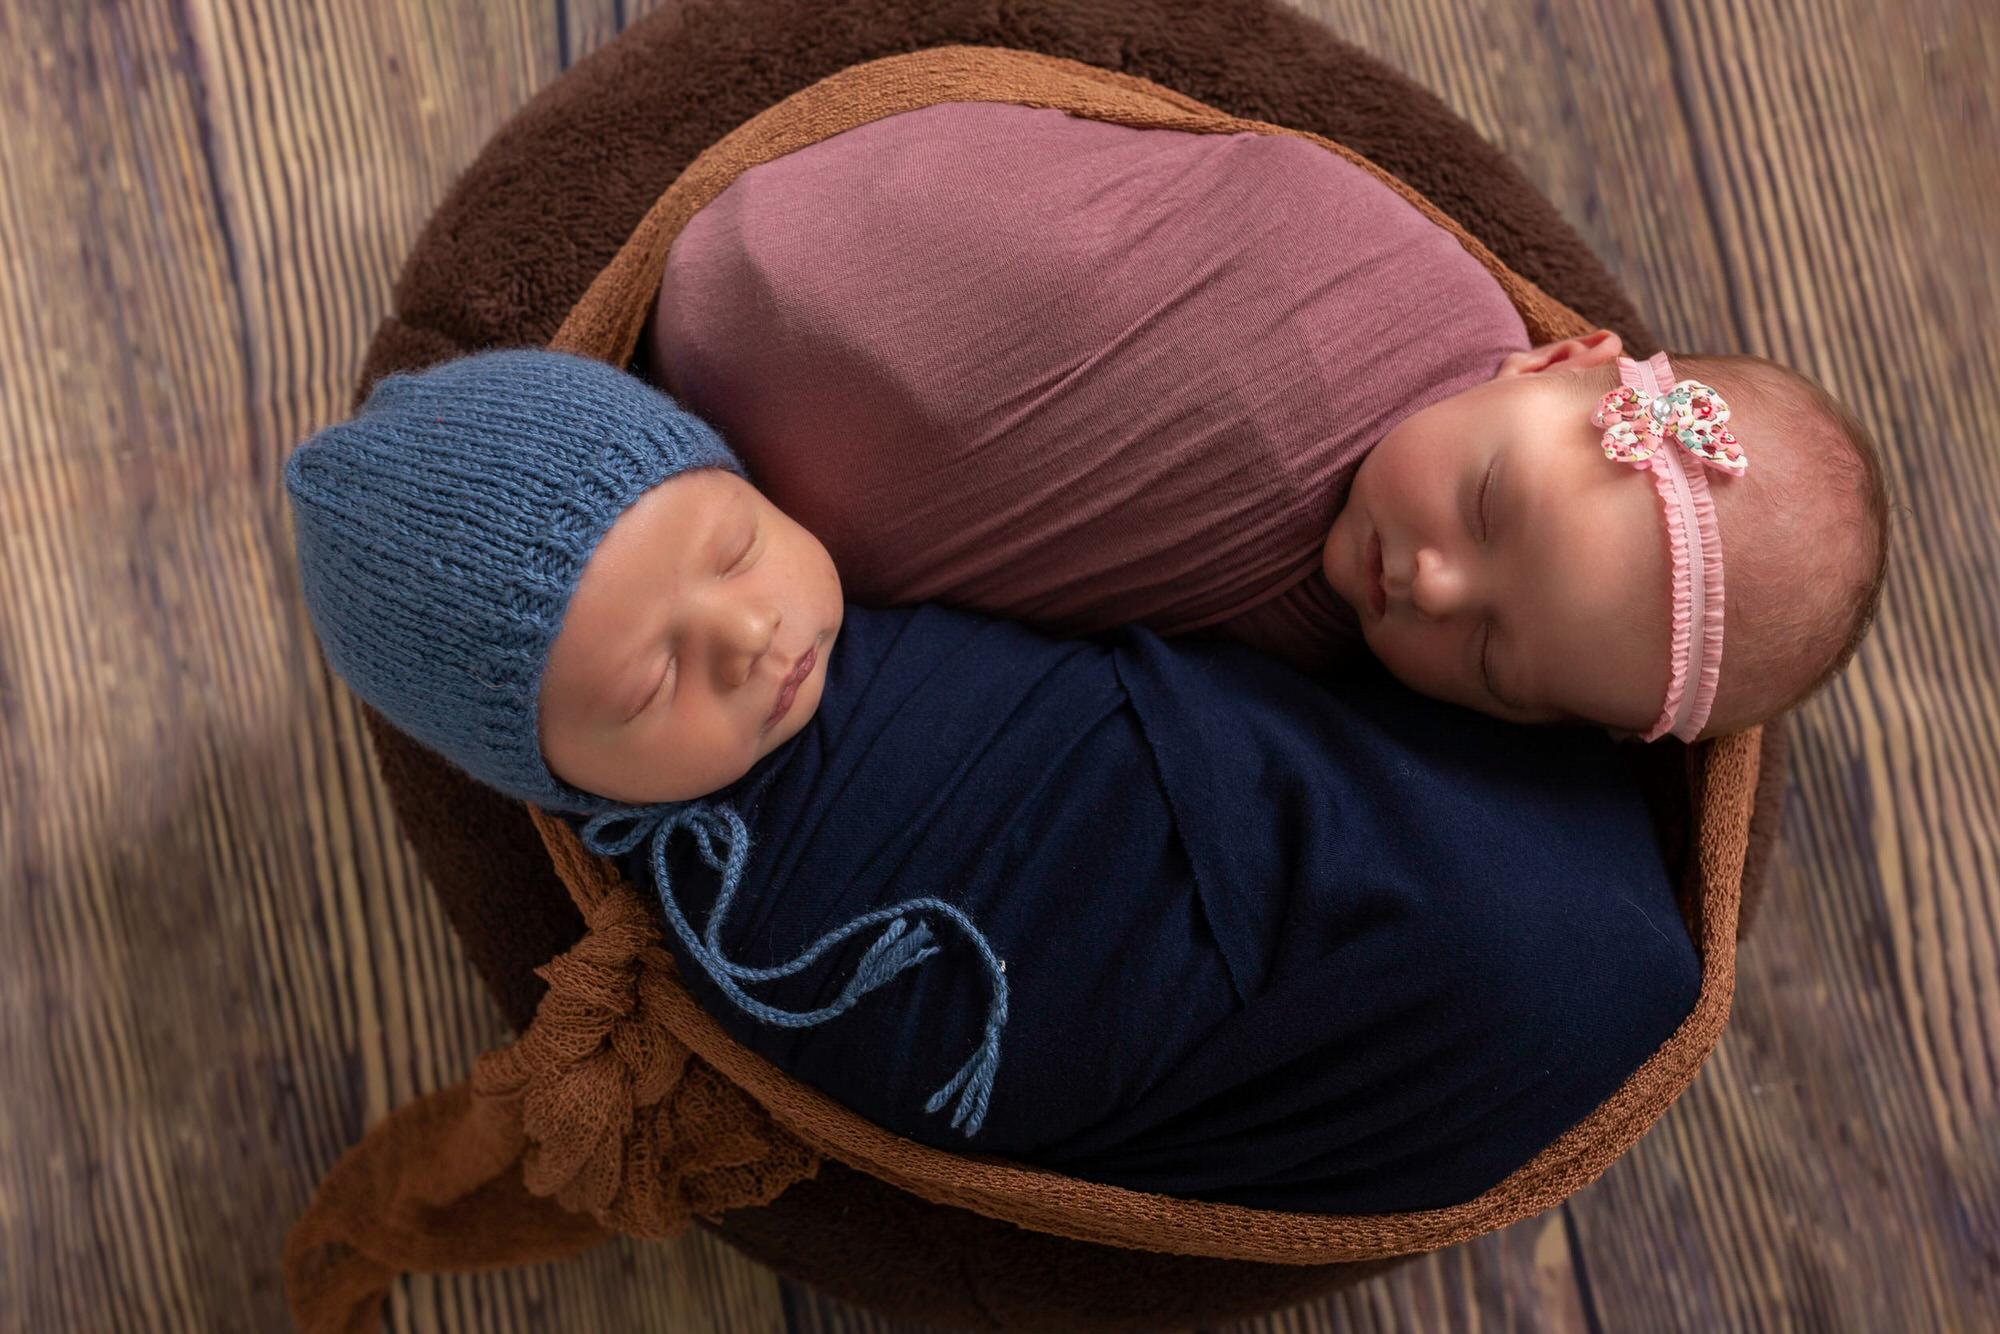 New baby Photographer Horsham Photographer, West Sussex Photographer, Newborn Photographer,